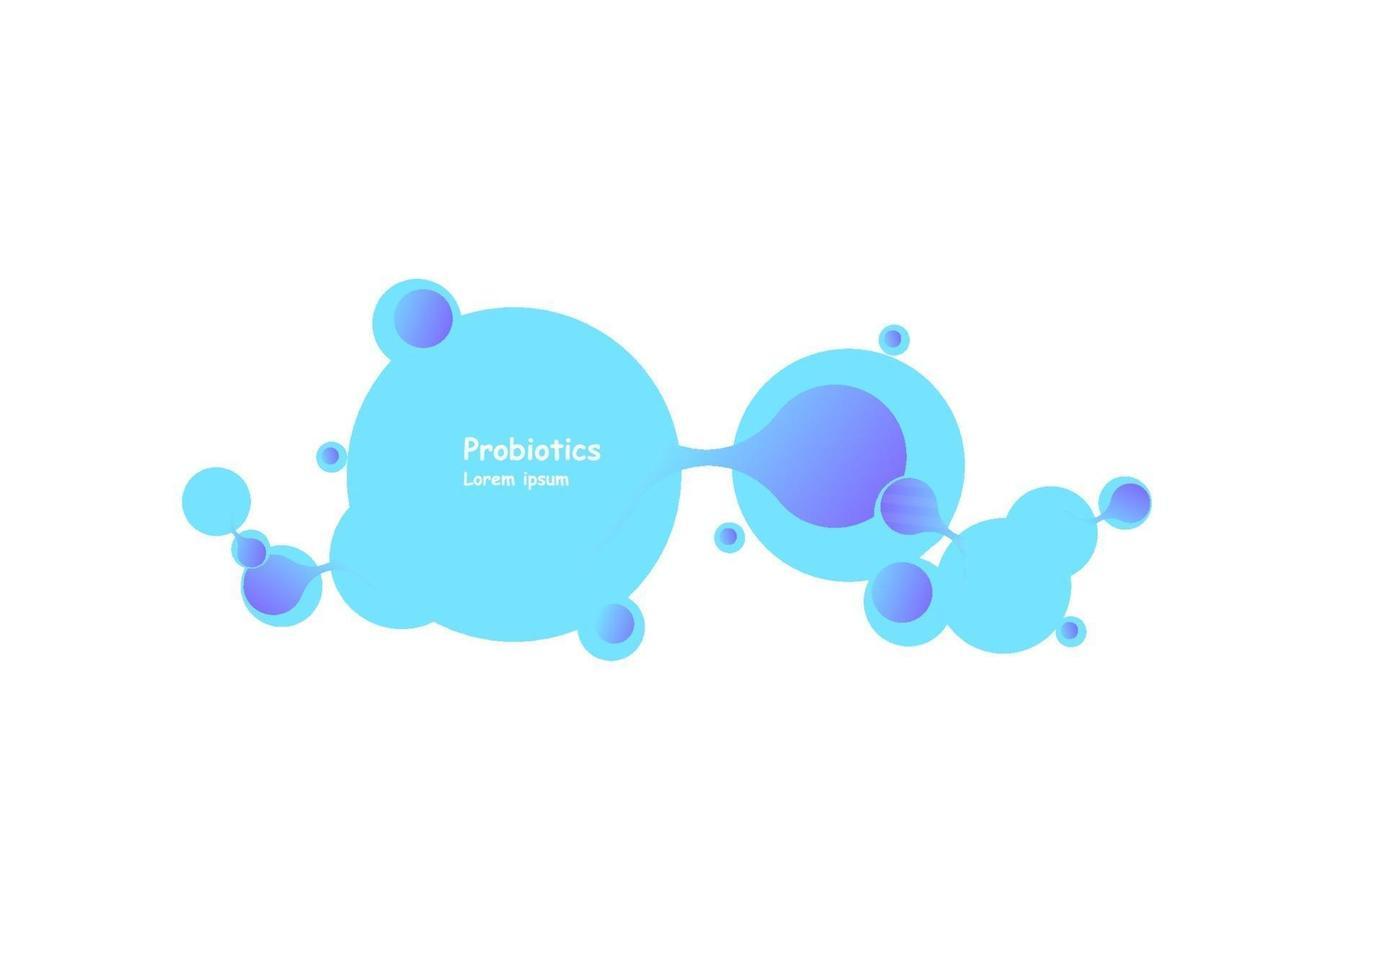 projeto de vetor de bactérias probióticos. projeto de vetor de bactérias probióticos.